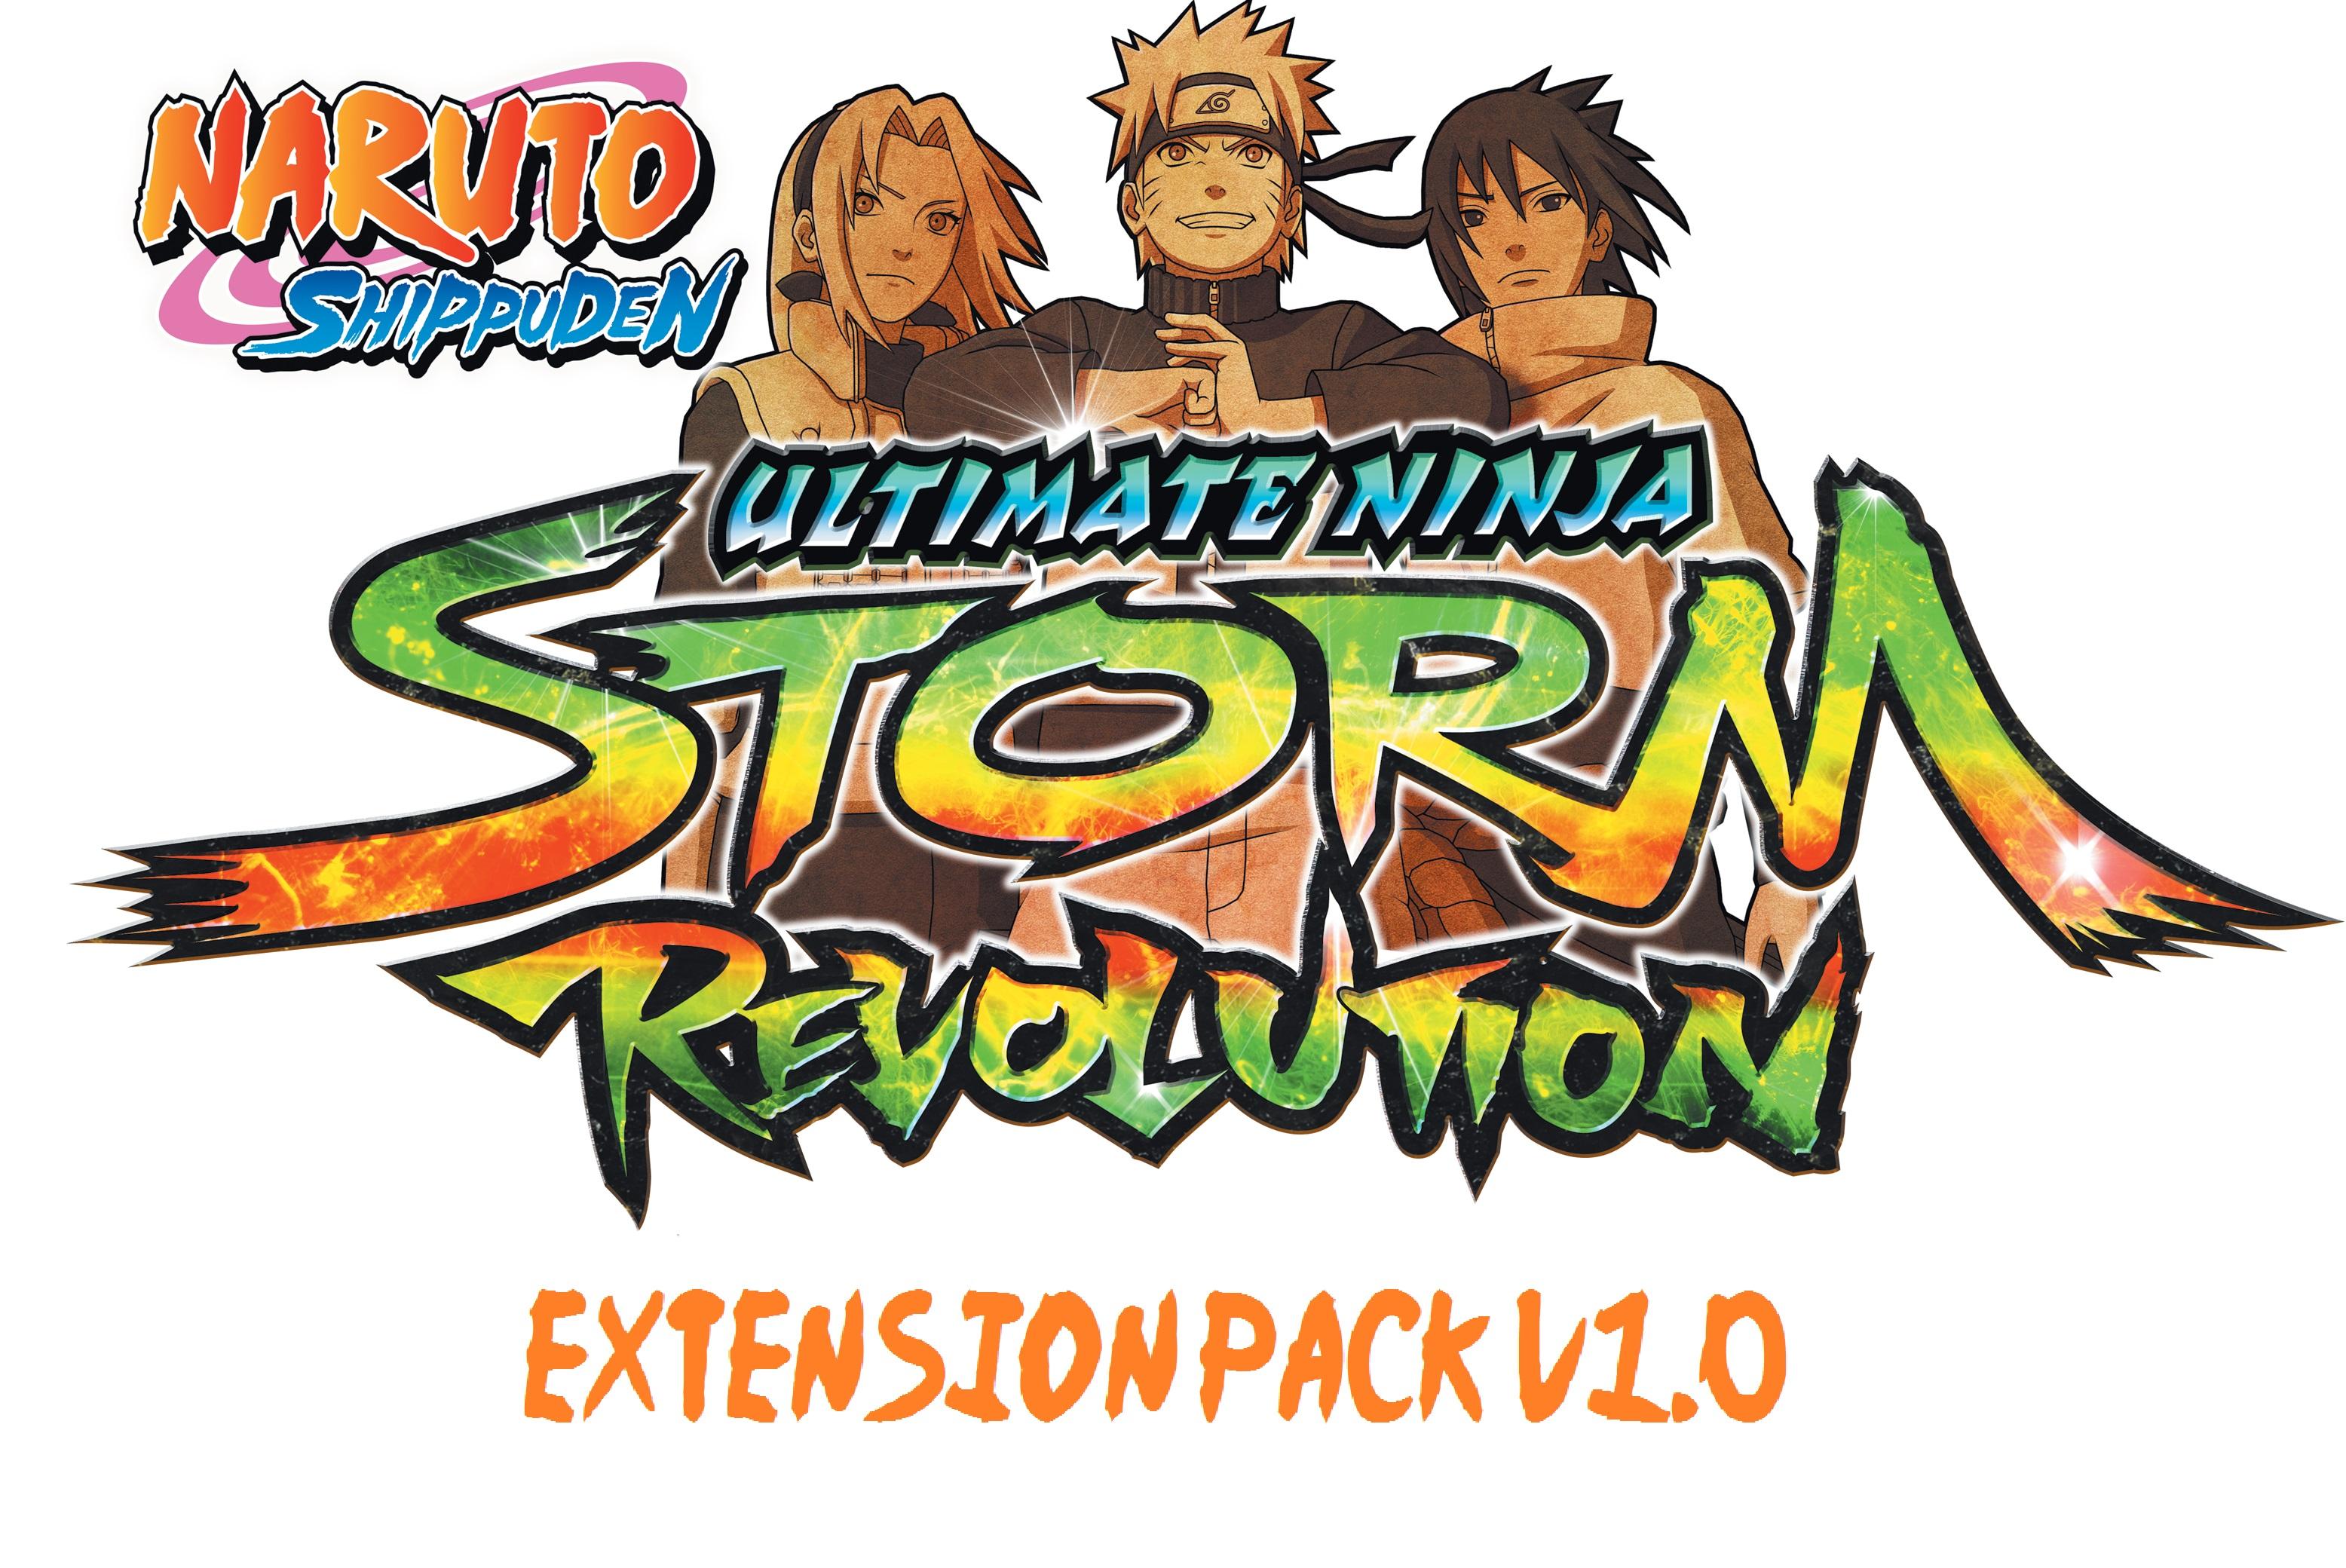 download naruto shippuden ultimate ninja storm revolution full crack